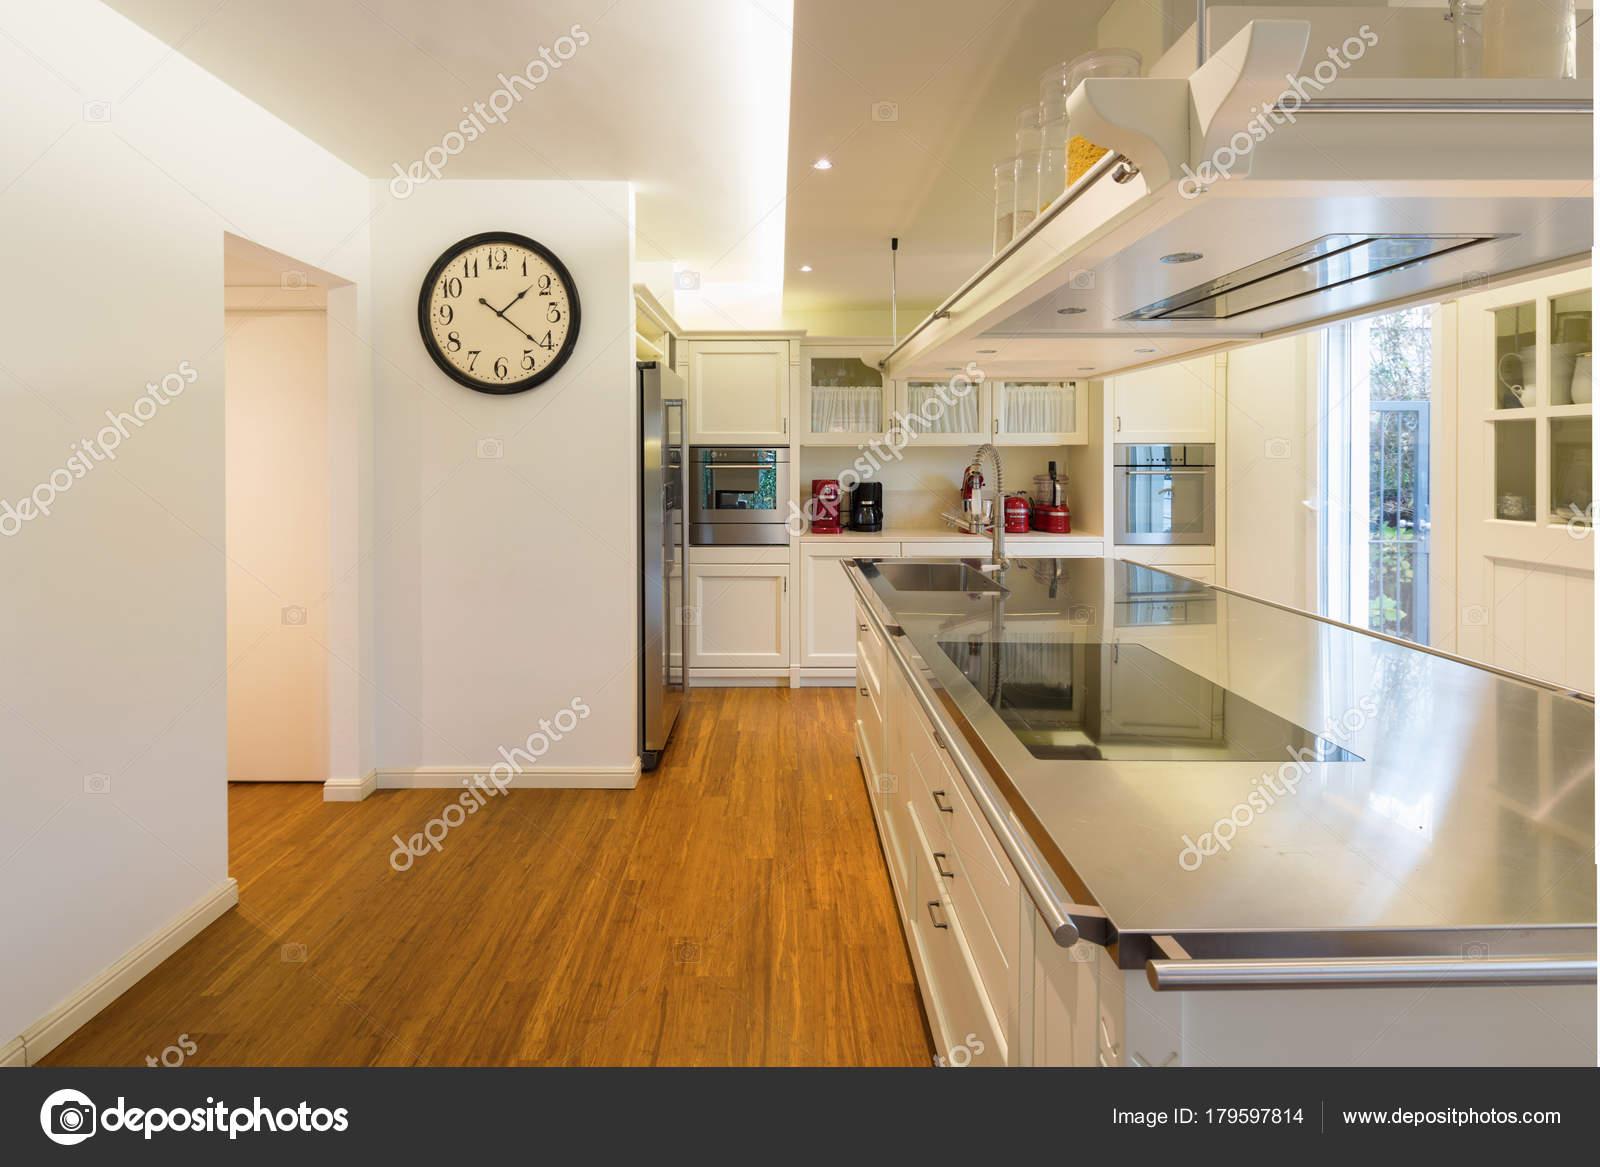 Moderne Küche Creme U2014 Stockfoto